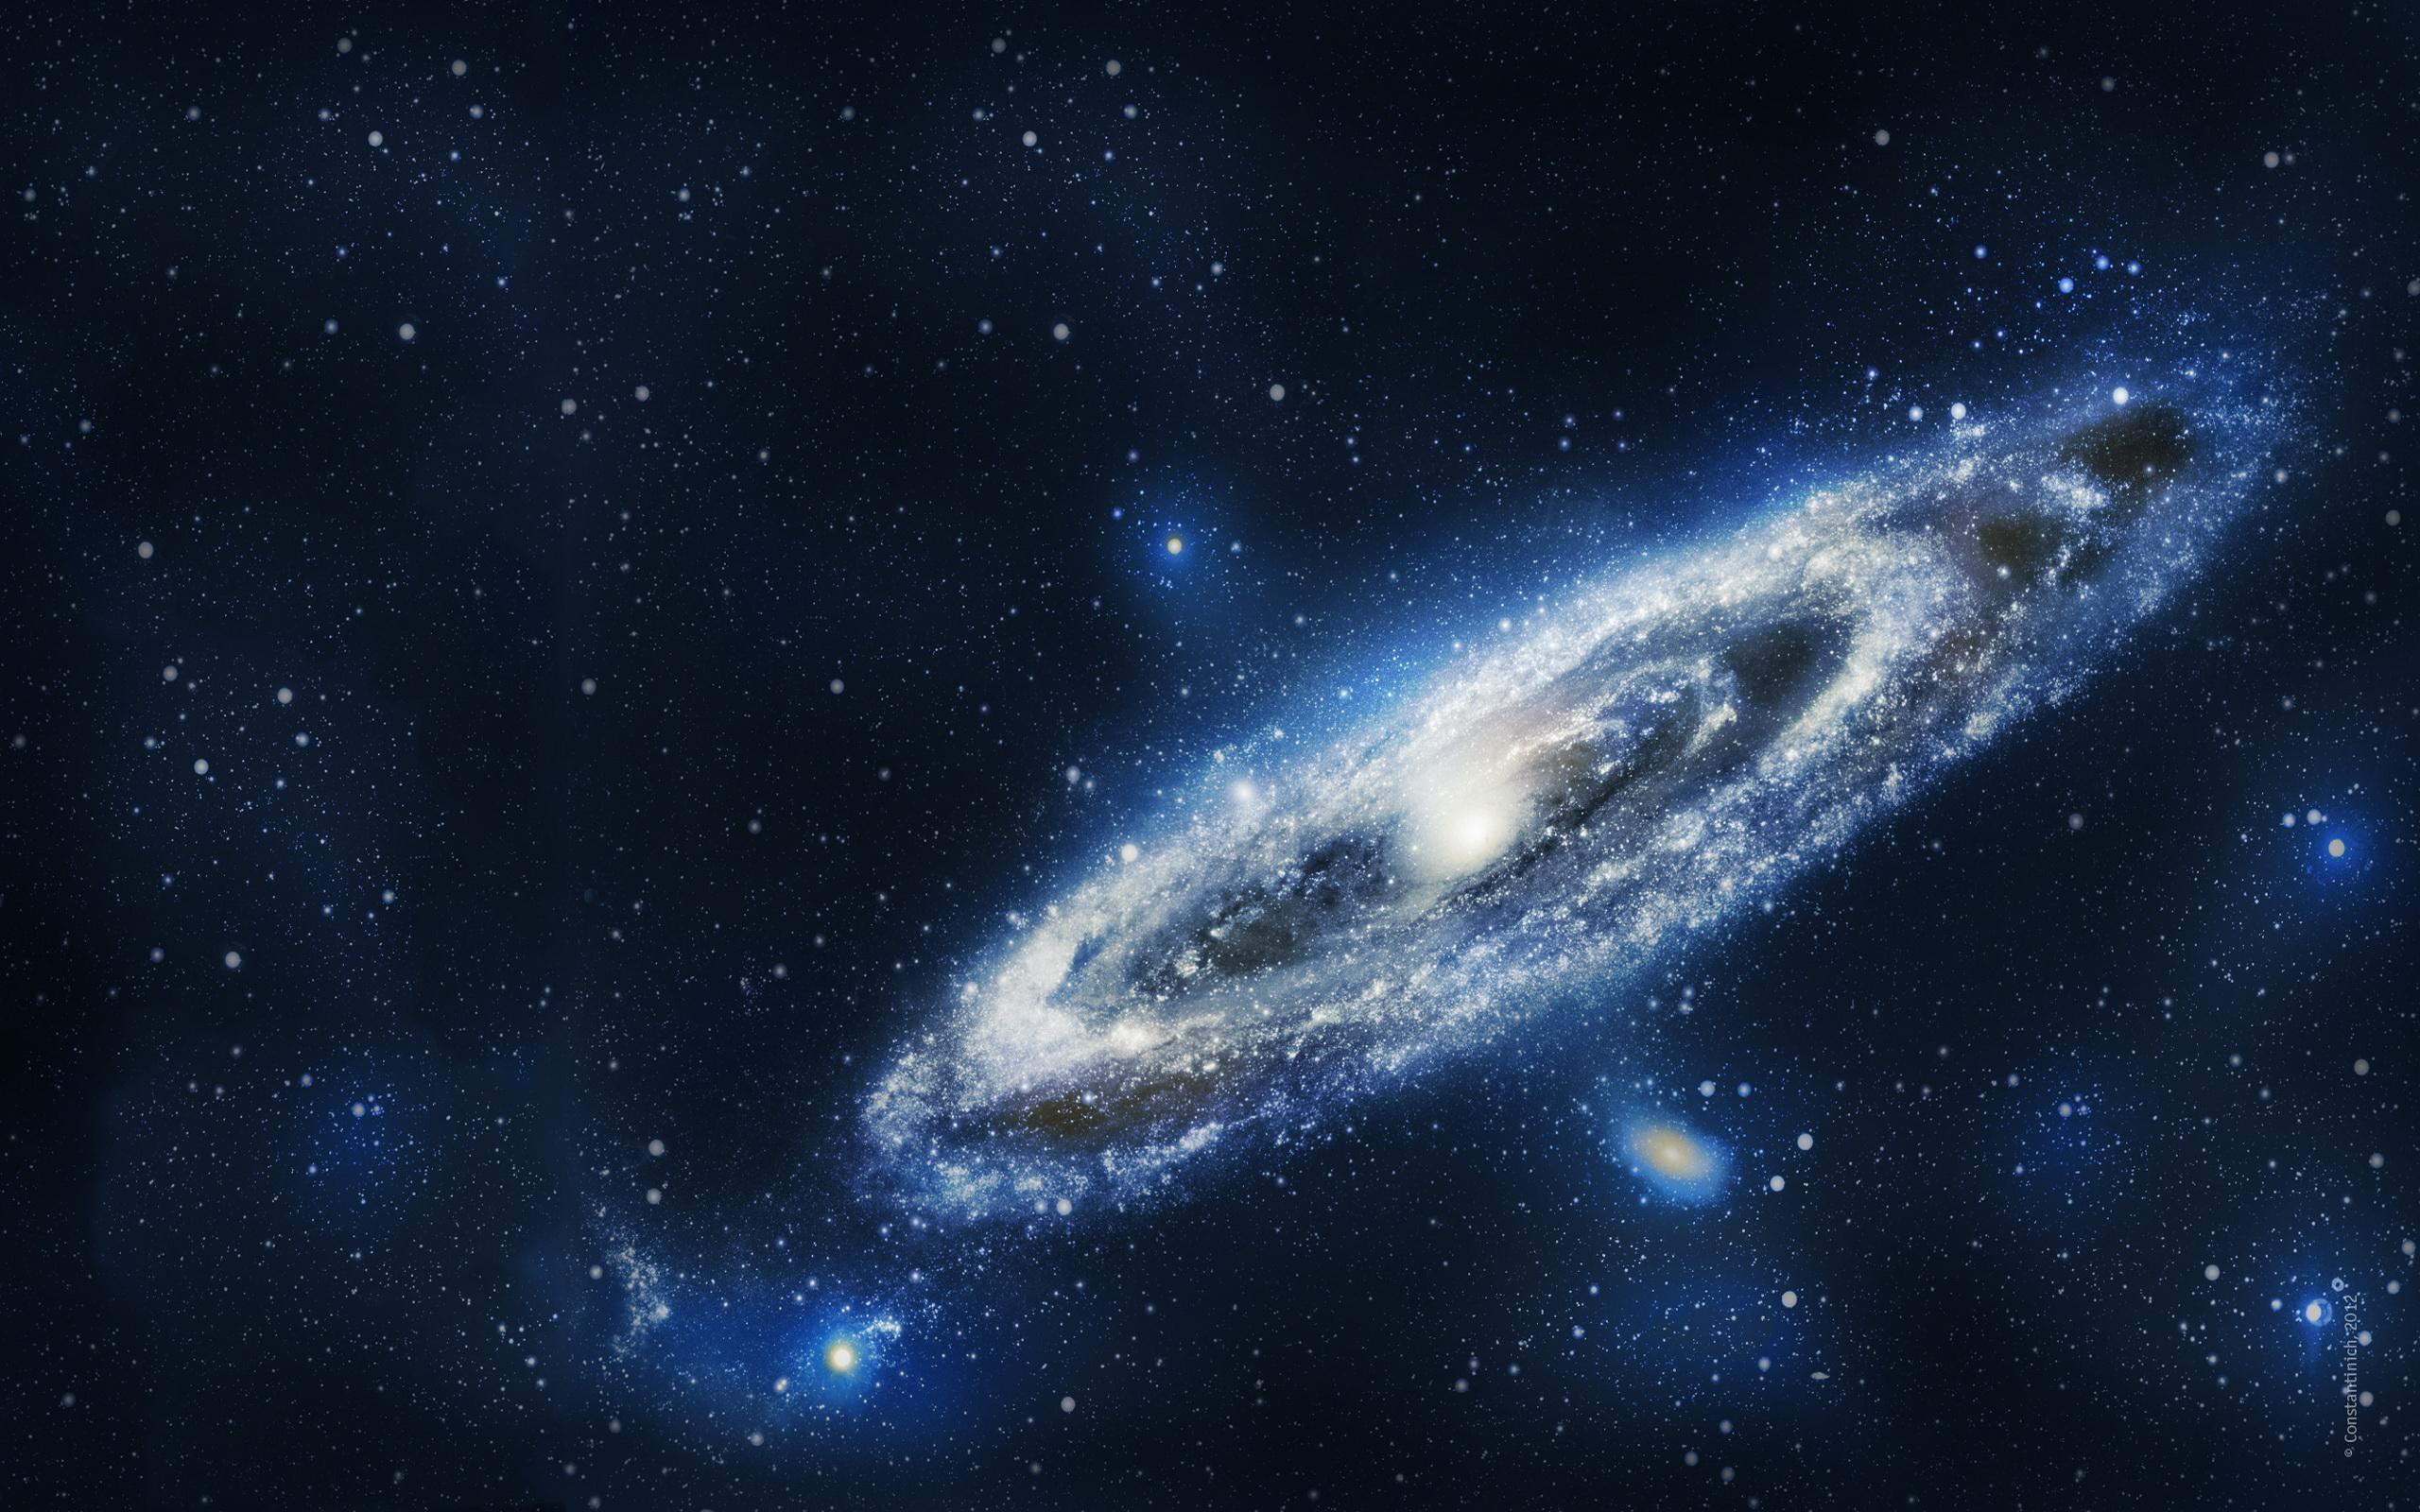 Galaxy HD Wallpaper | Background Image | 2560x1600 | ID ...